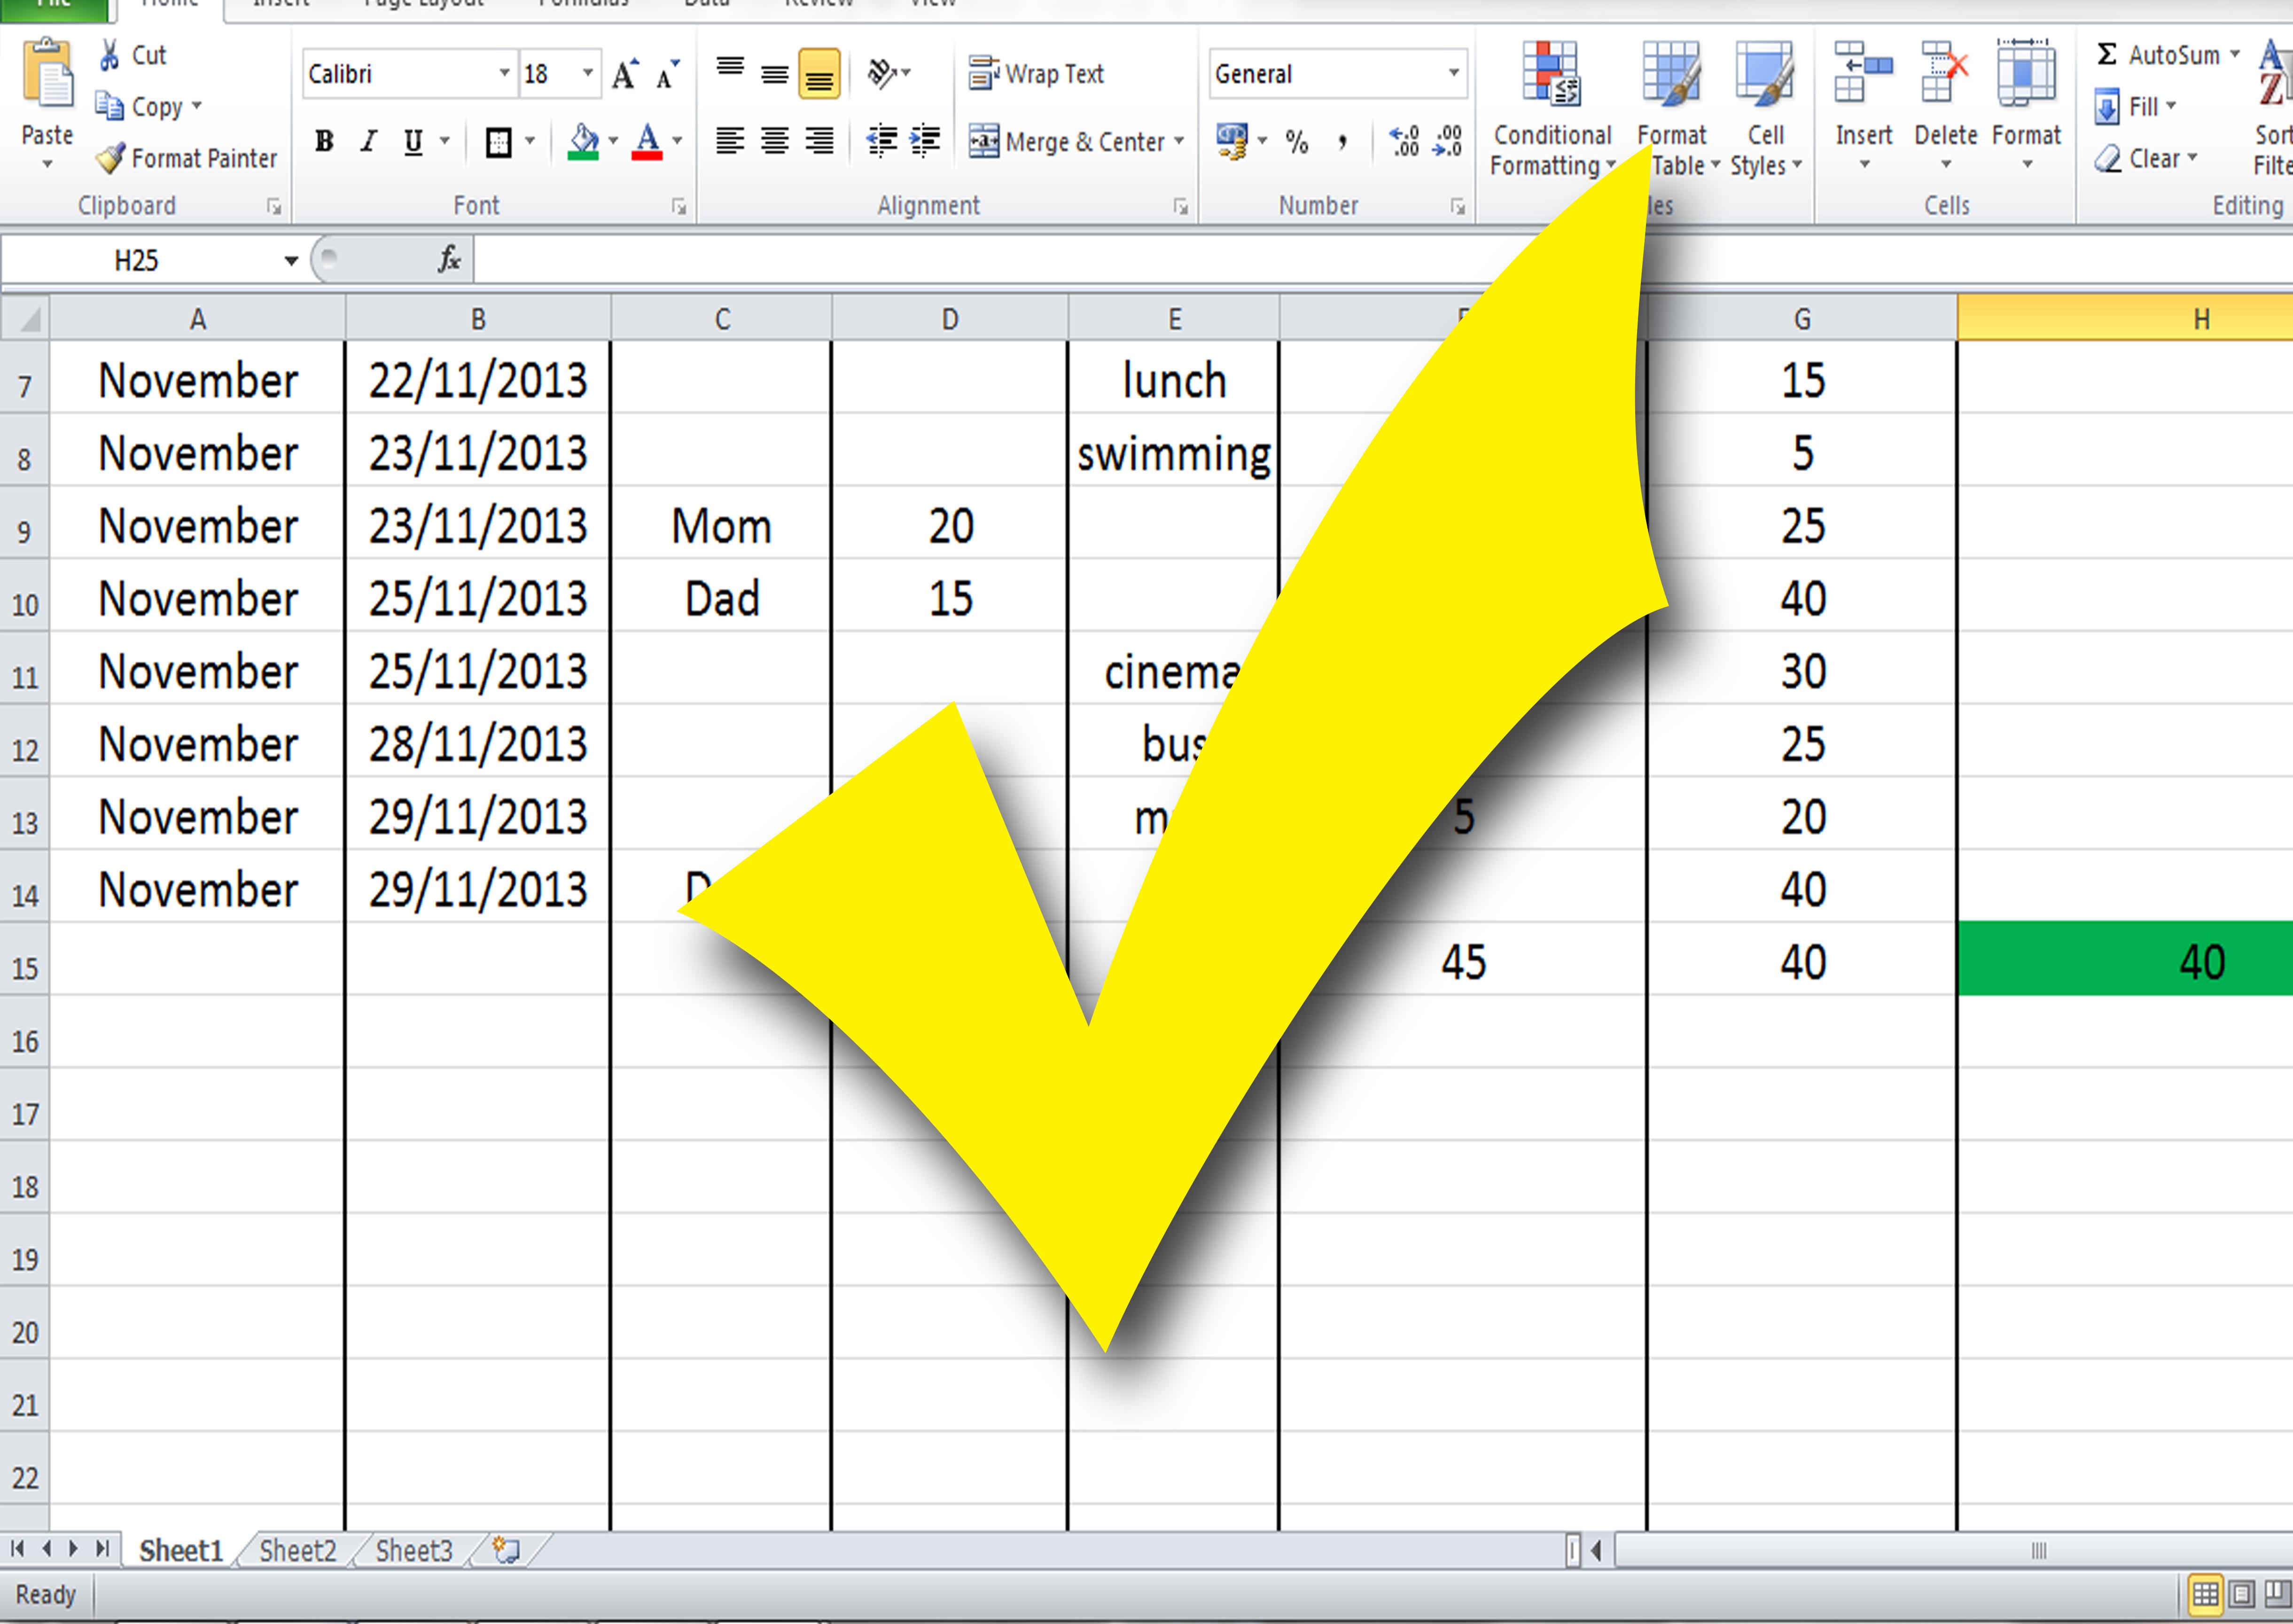 How Do I Make A Budget Spreadsheet Intended For How To Build A Budget Spreadsheet Teenagers: 13 Steps